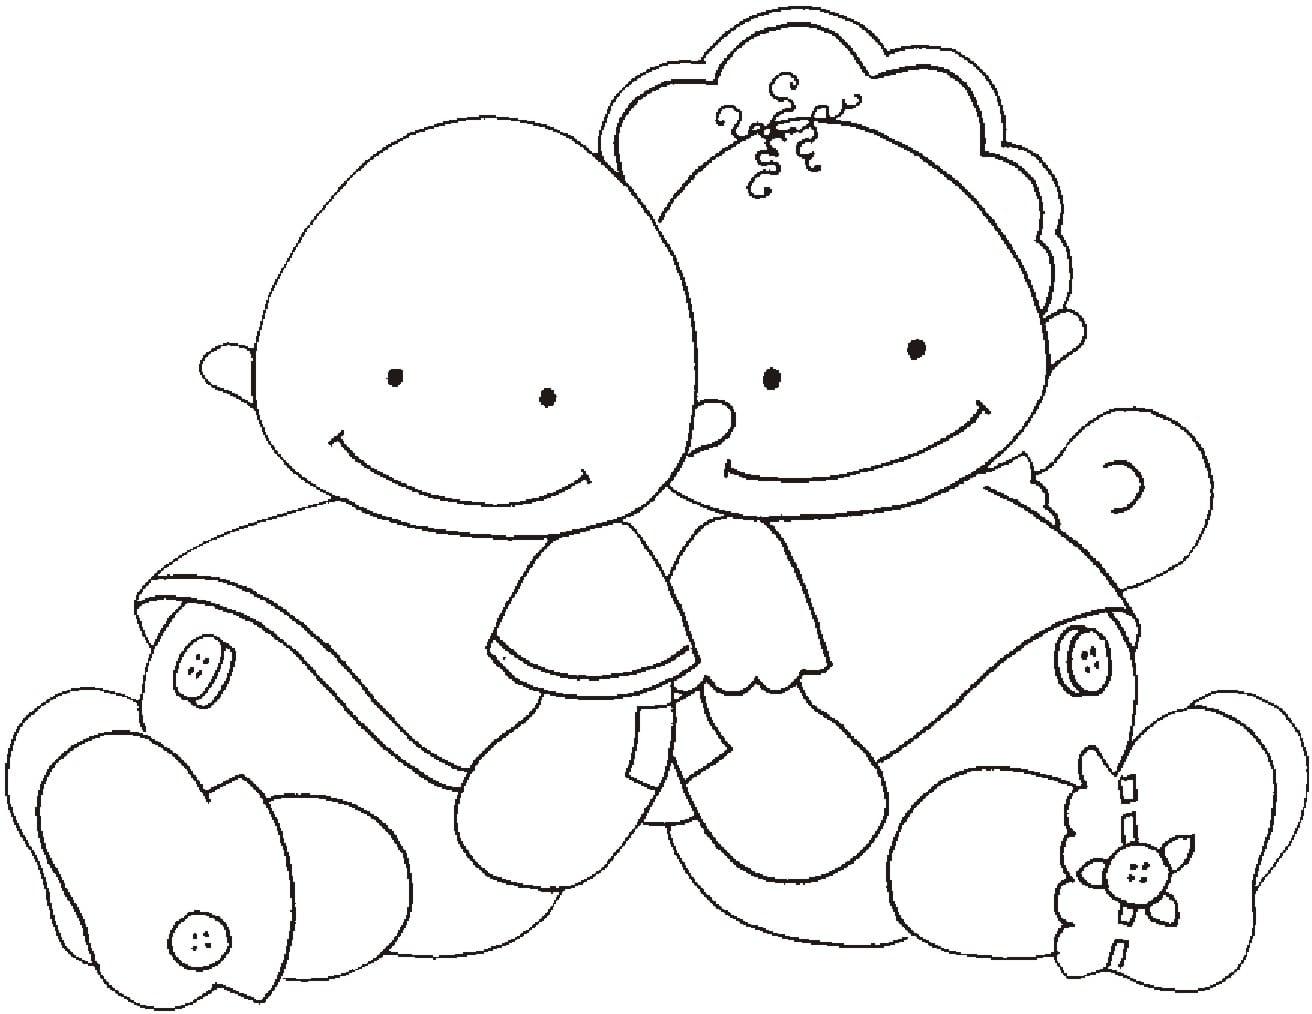 Dibujos Para Recien Nacidos. Finest Simple Free Stunning Amazing ...